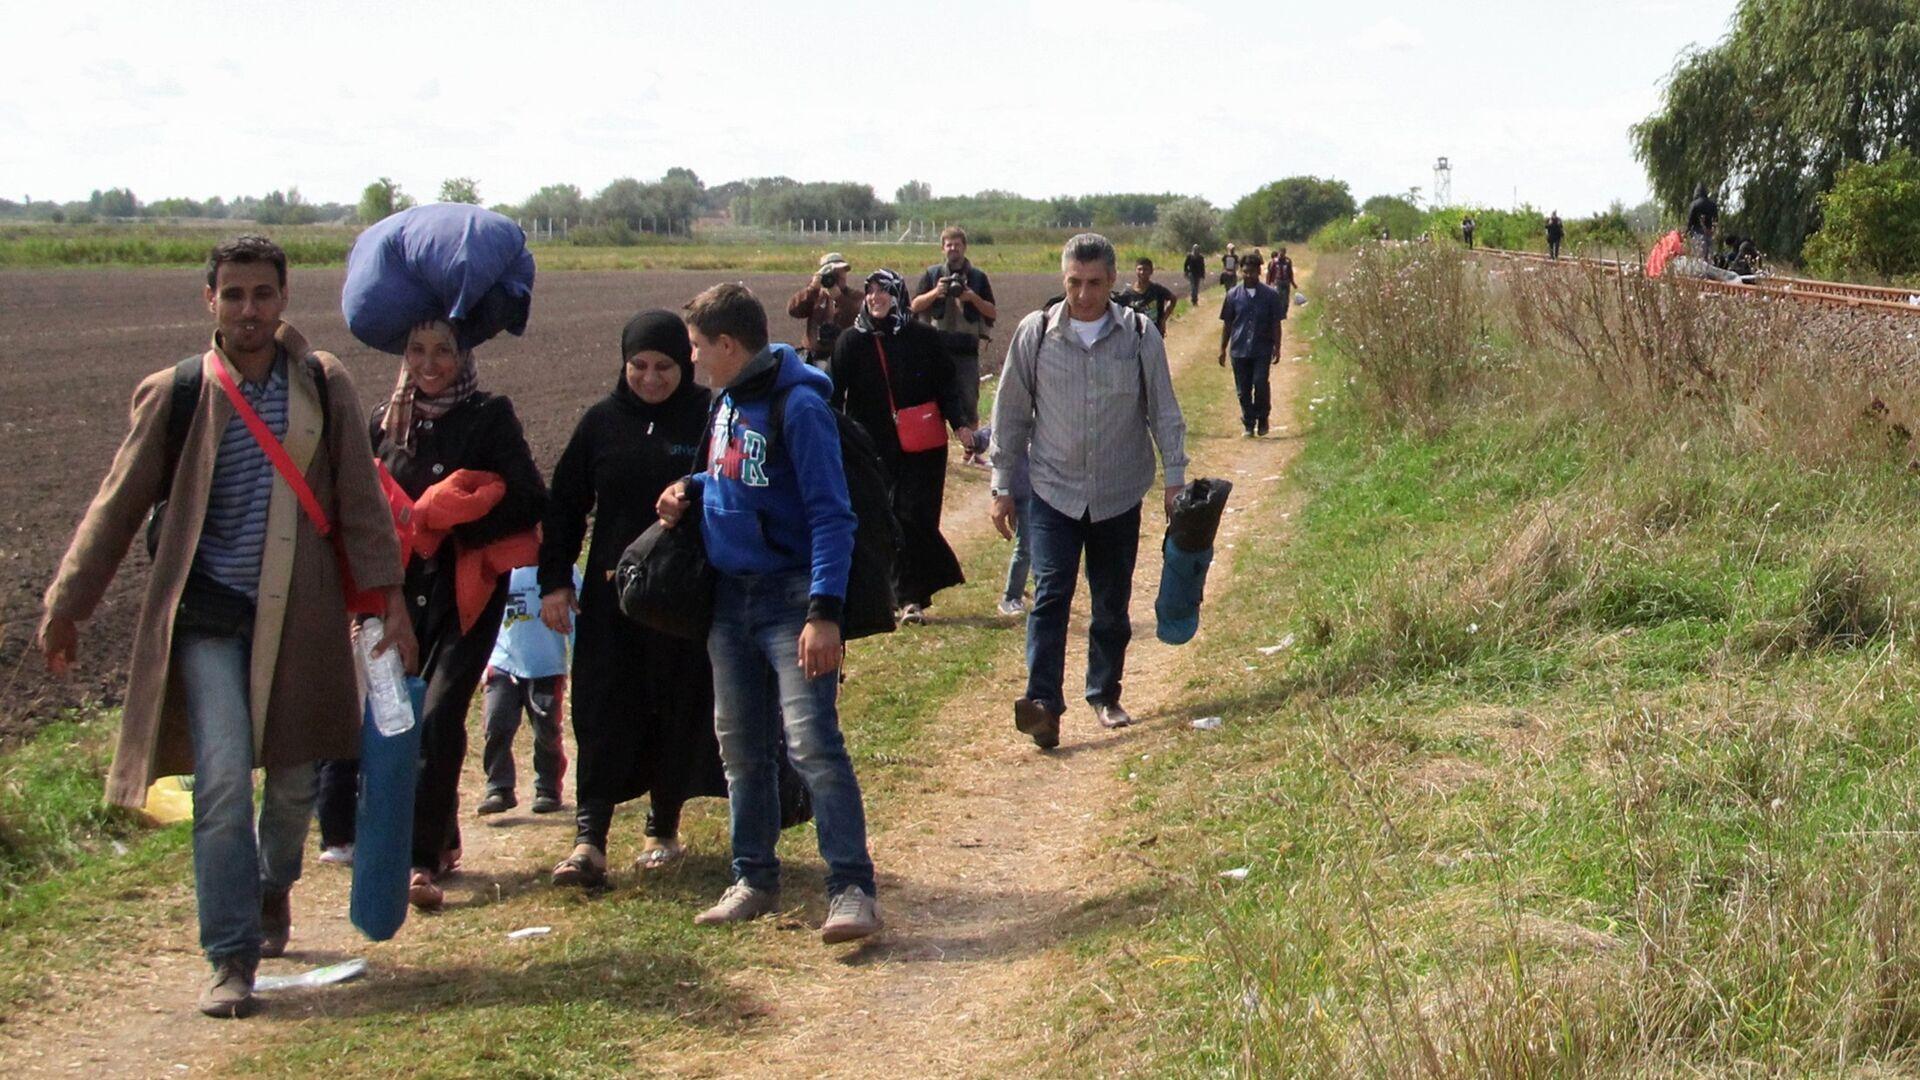 Беженцы в Европе. Архивное фото - Sputnik Таджикистан, 1920, 24.07.2021